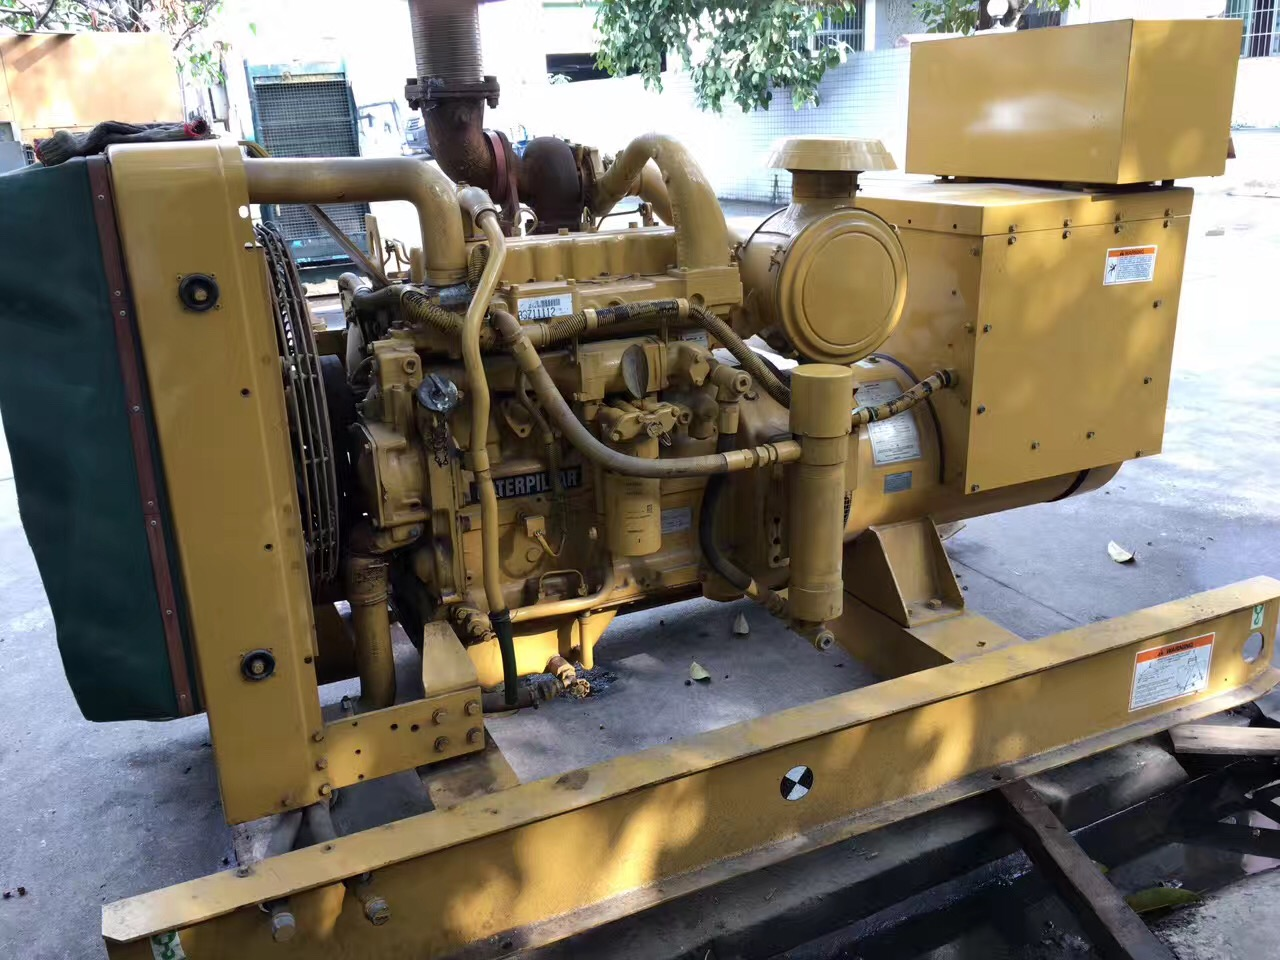 Prime 100kw 125kva used Caterpillar diesel generator